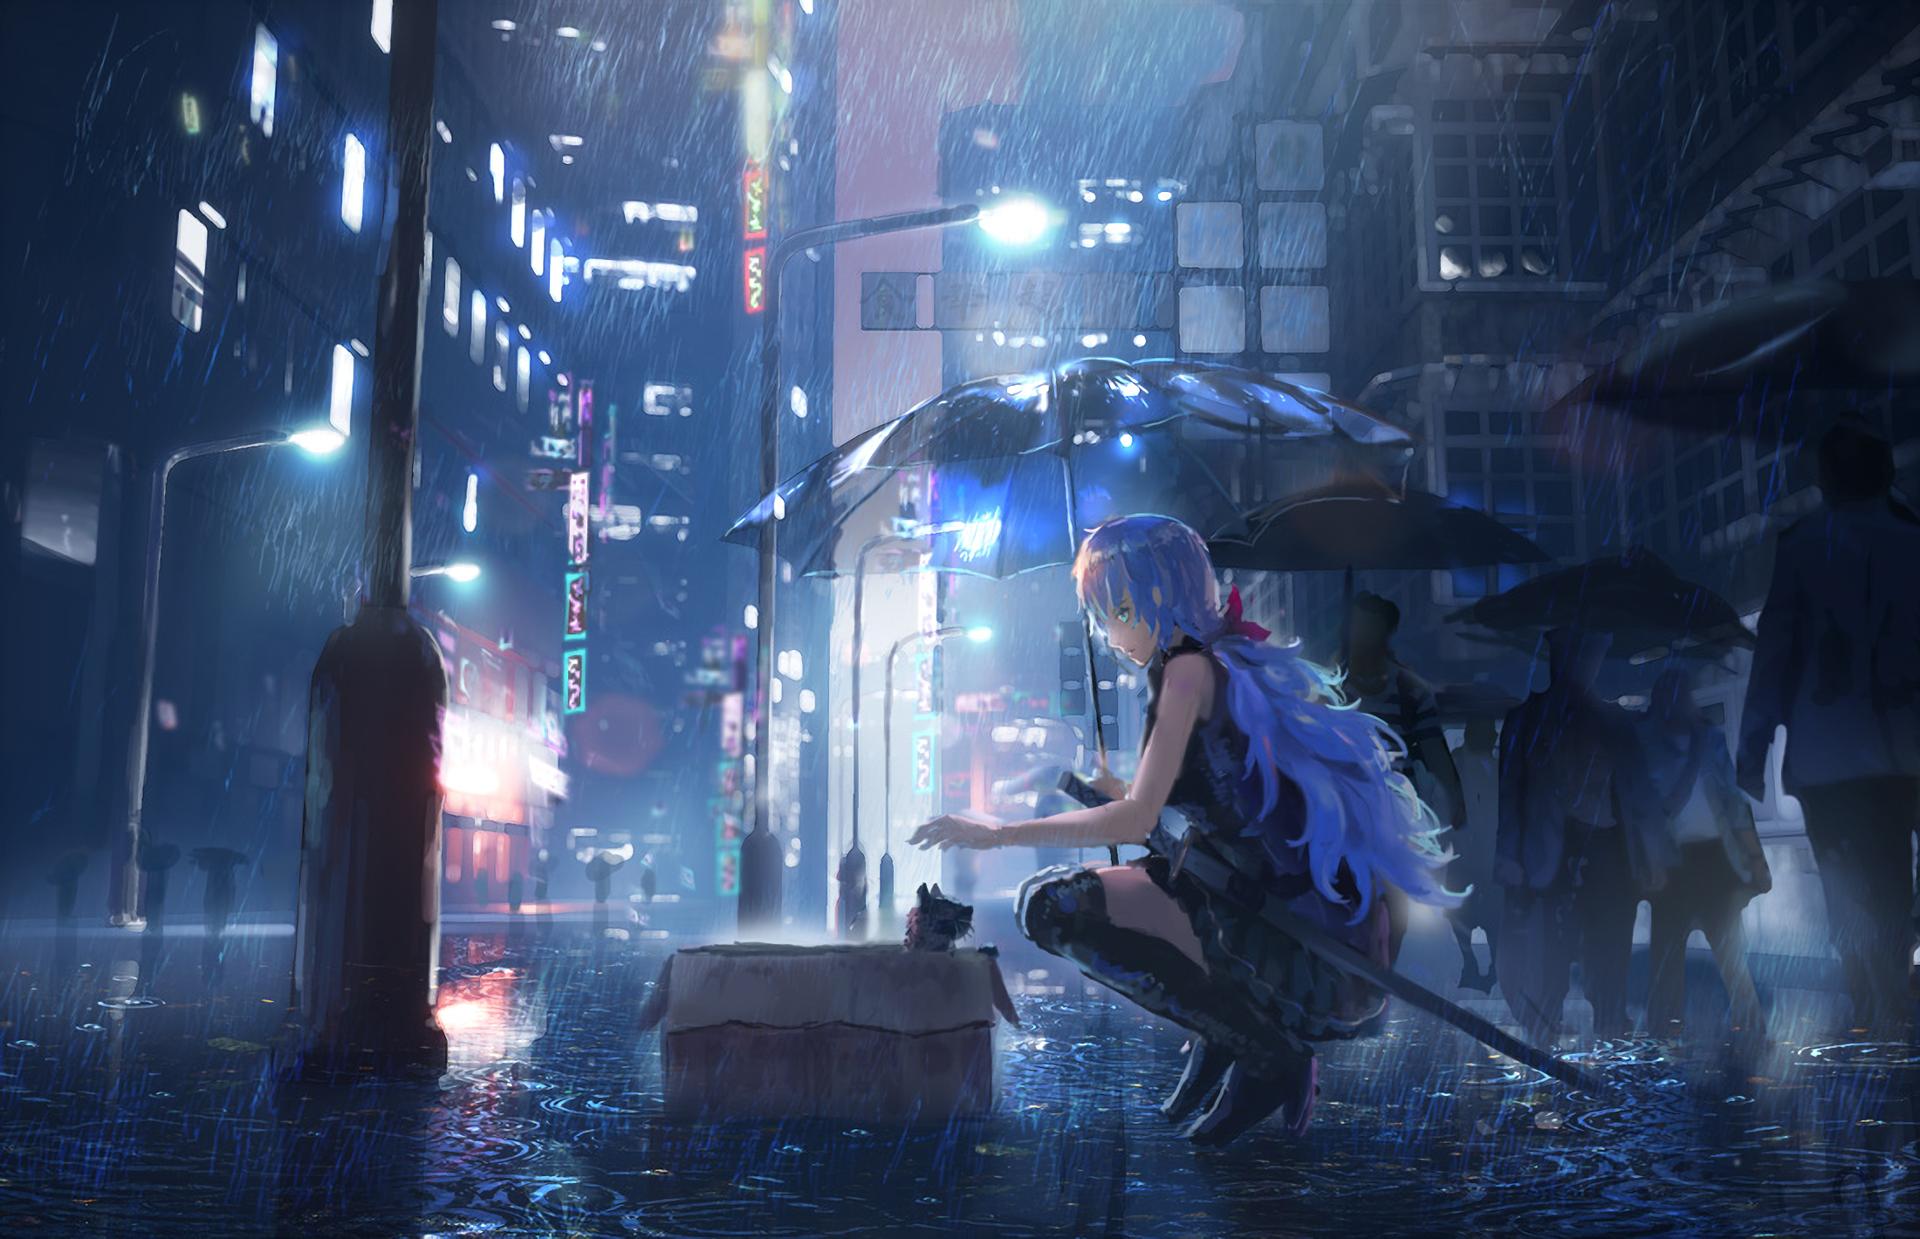 Anime Original Rain Umbrella Girl Wallpaper | Cat city ...